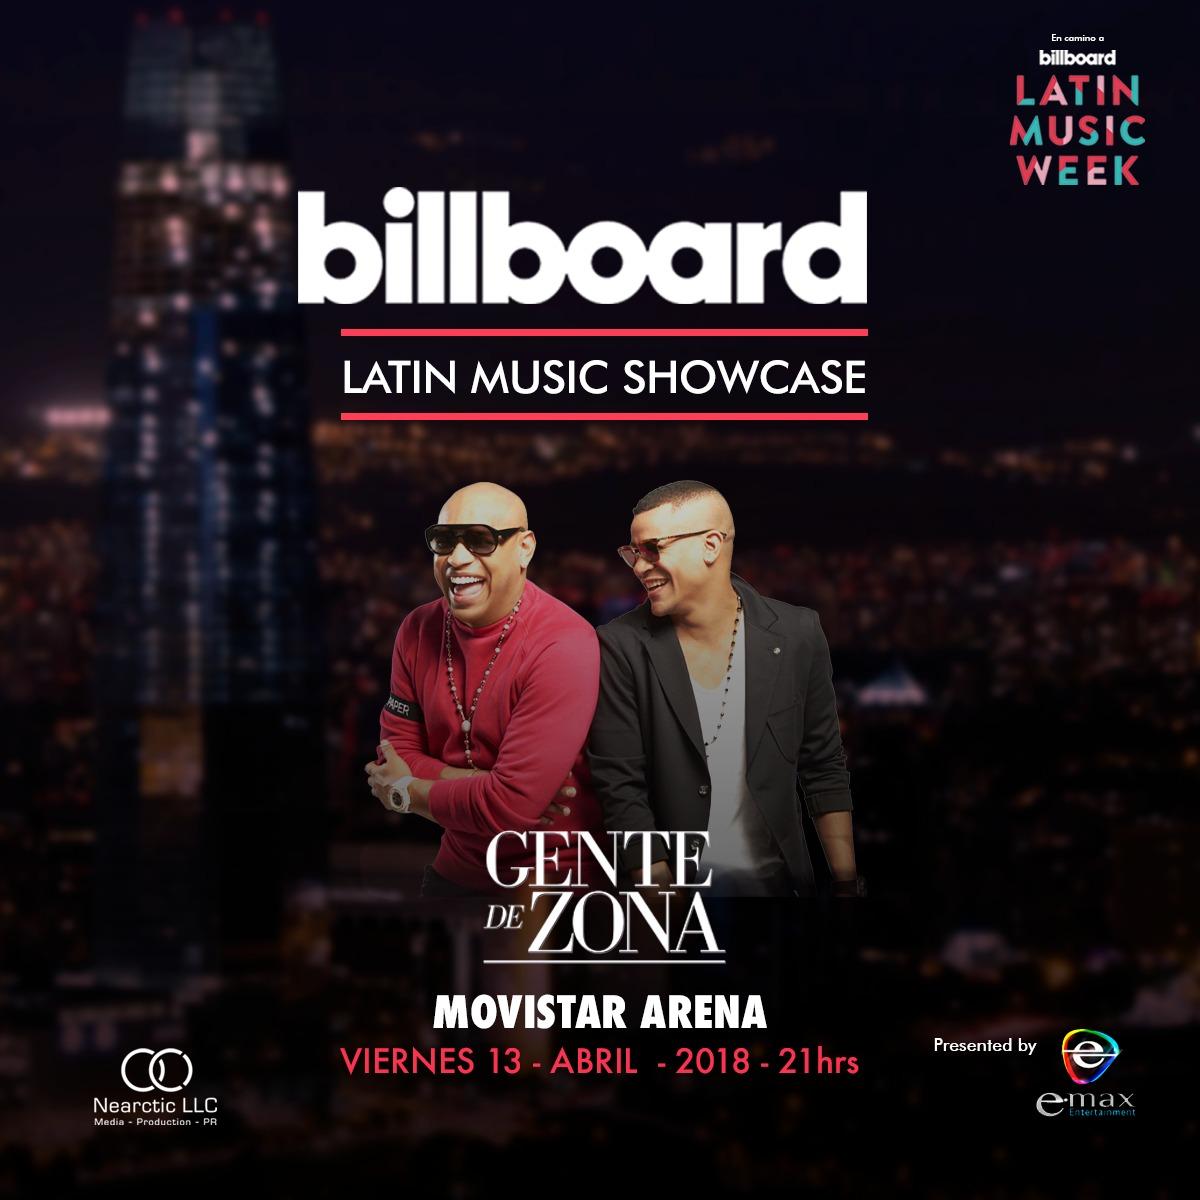 Billboard Latin Music Showcase Chile reunirá importantes figuras de la música latina actual